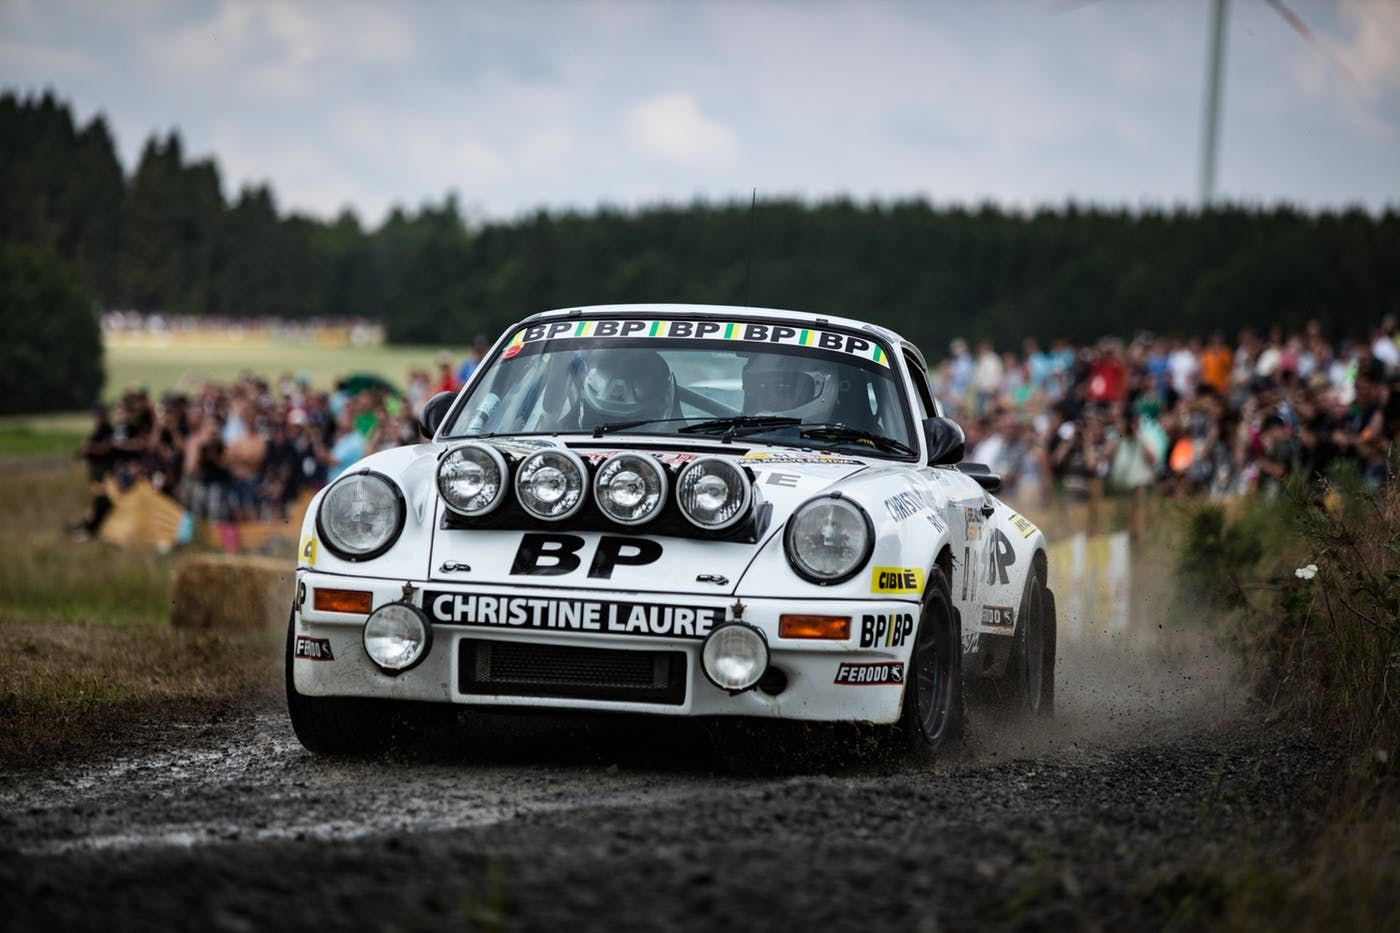 Porsche at the Eifel classic rallye | DRIVETRIBE